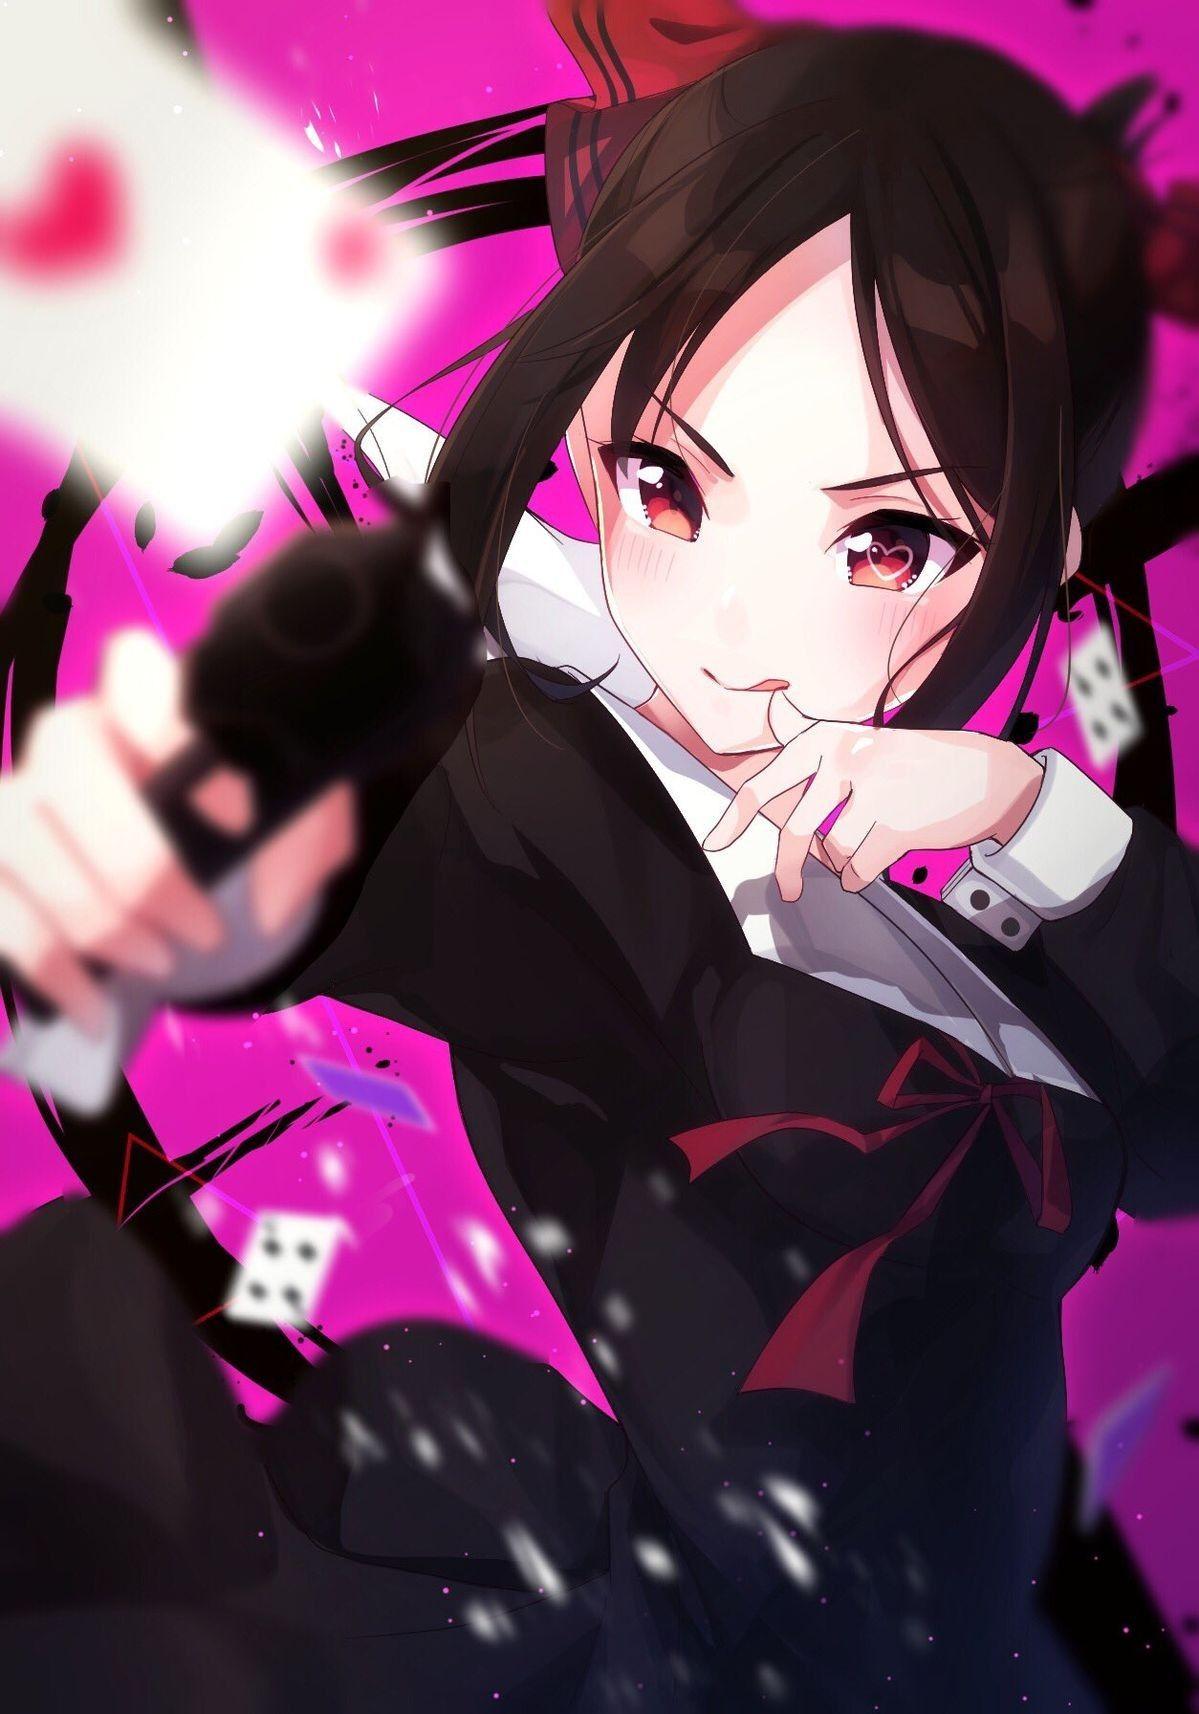 Pin de AnimeZone em Anime Anime kawaii, Menina anime, Anime